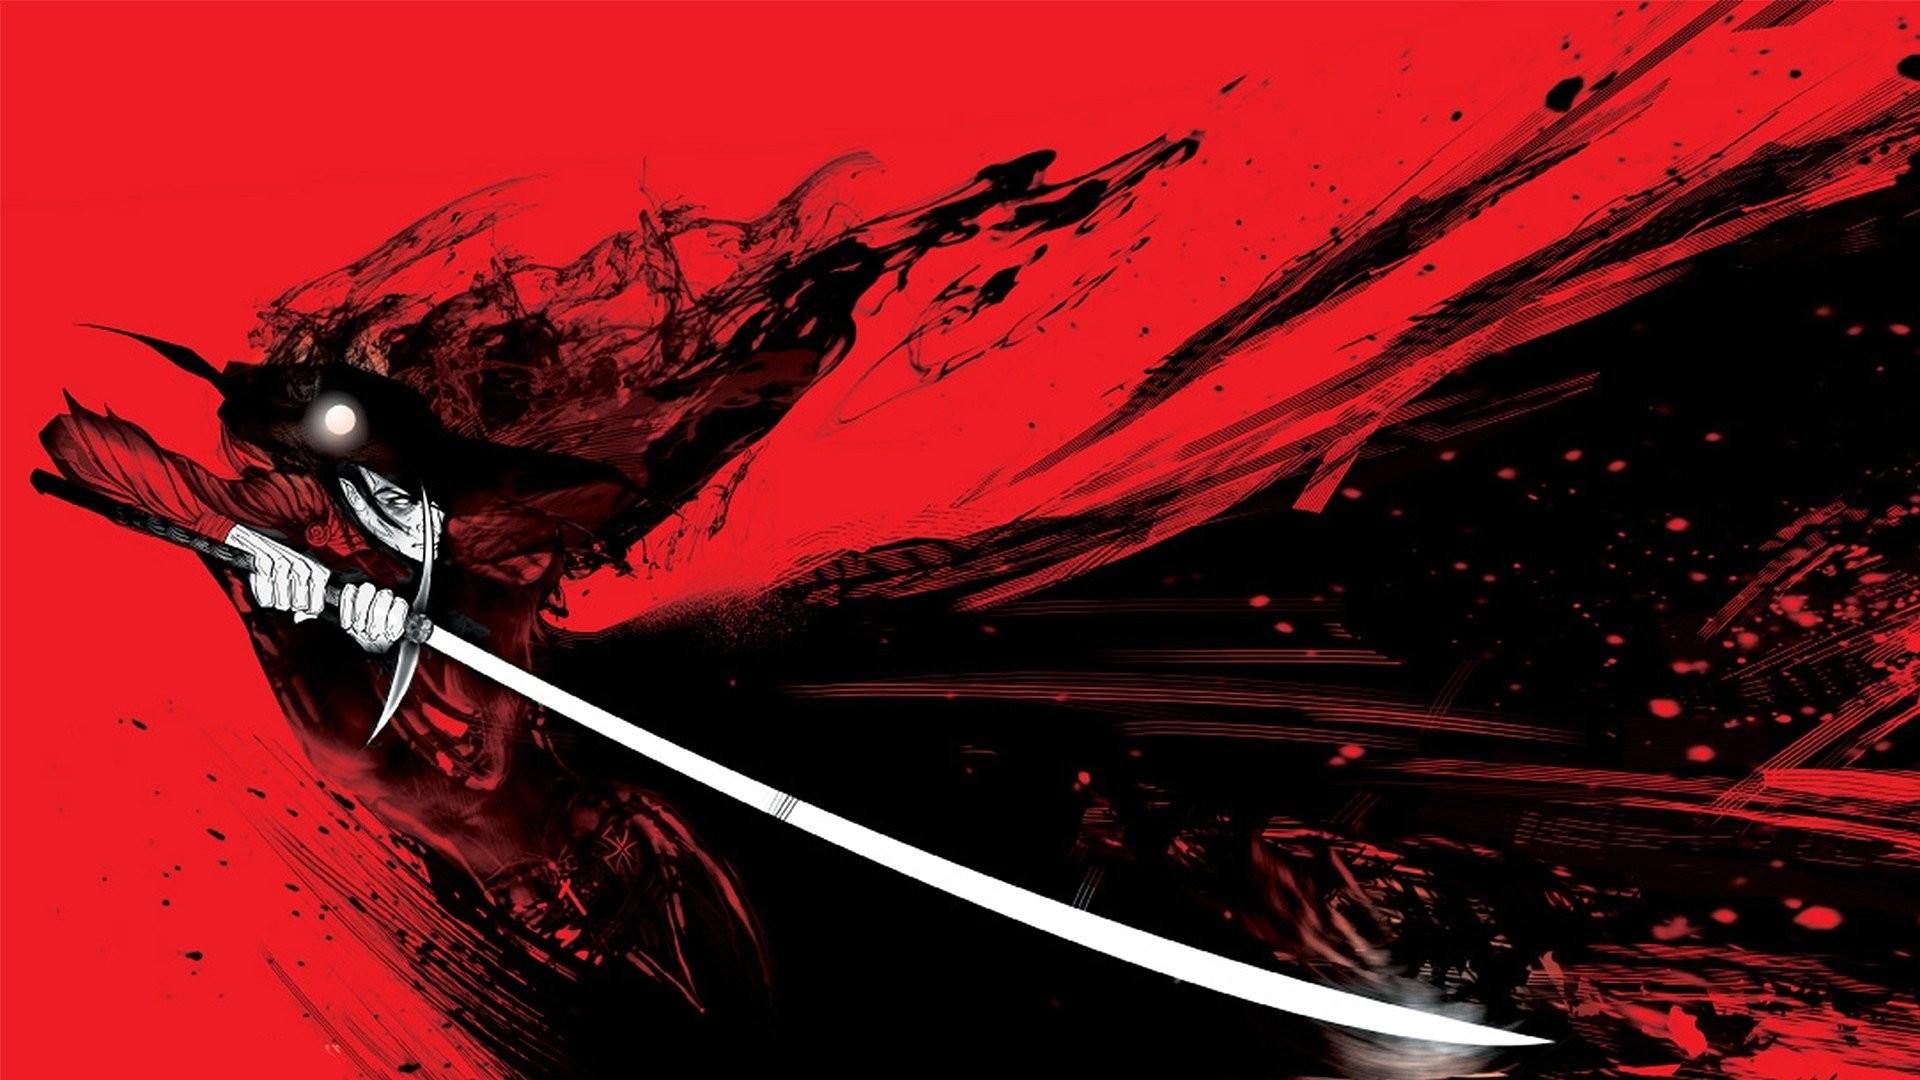 36 Vampire Hunter D HD Wallpapers | Backgrounds – Wallpaper Abyss